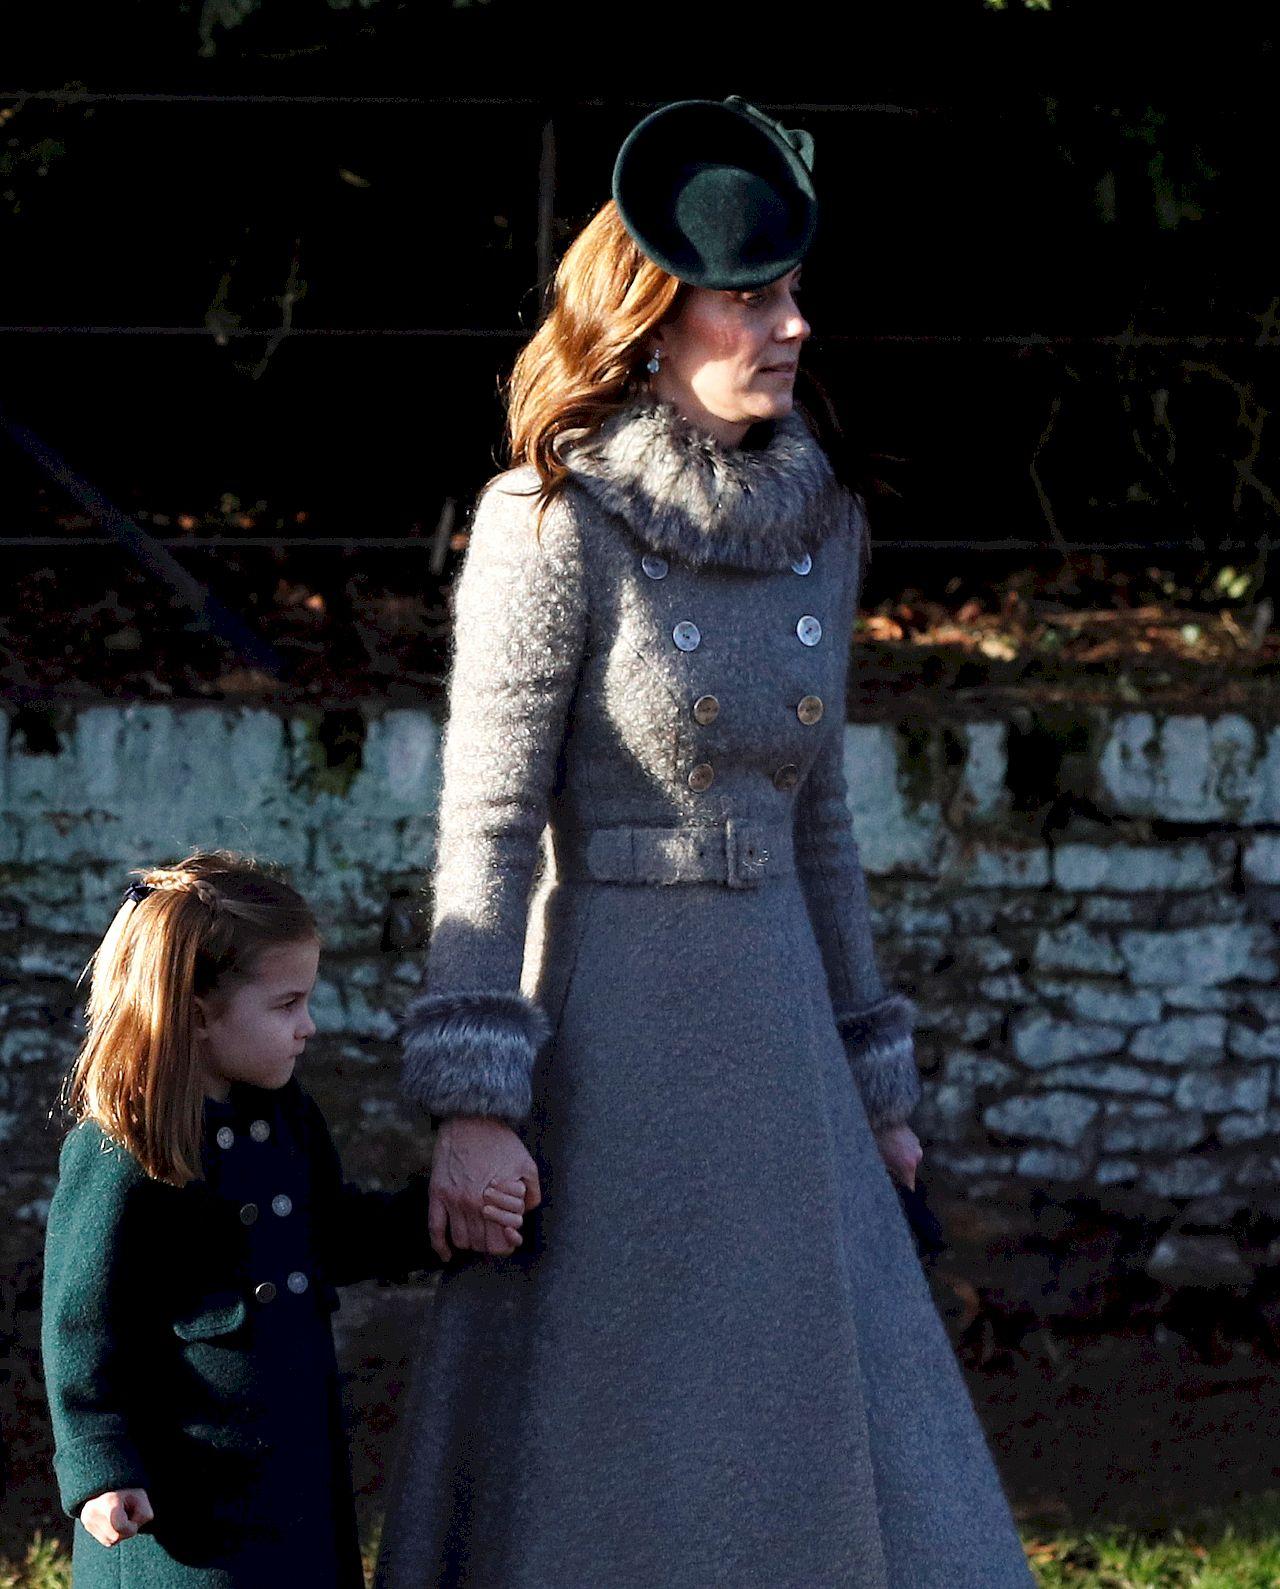 Księżna Kate z księżniczką Charlotte w Sandringham